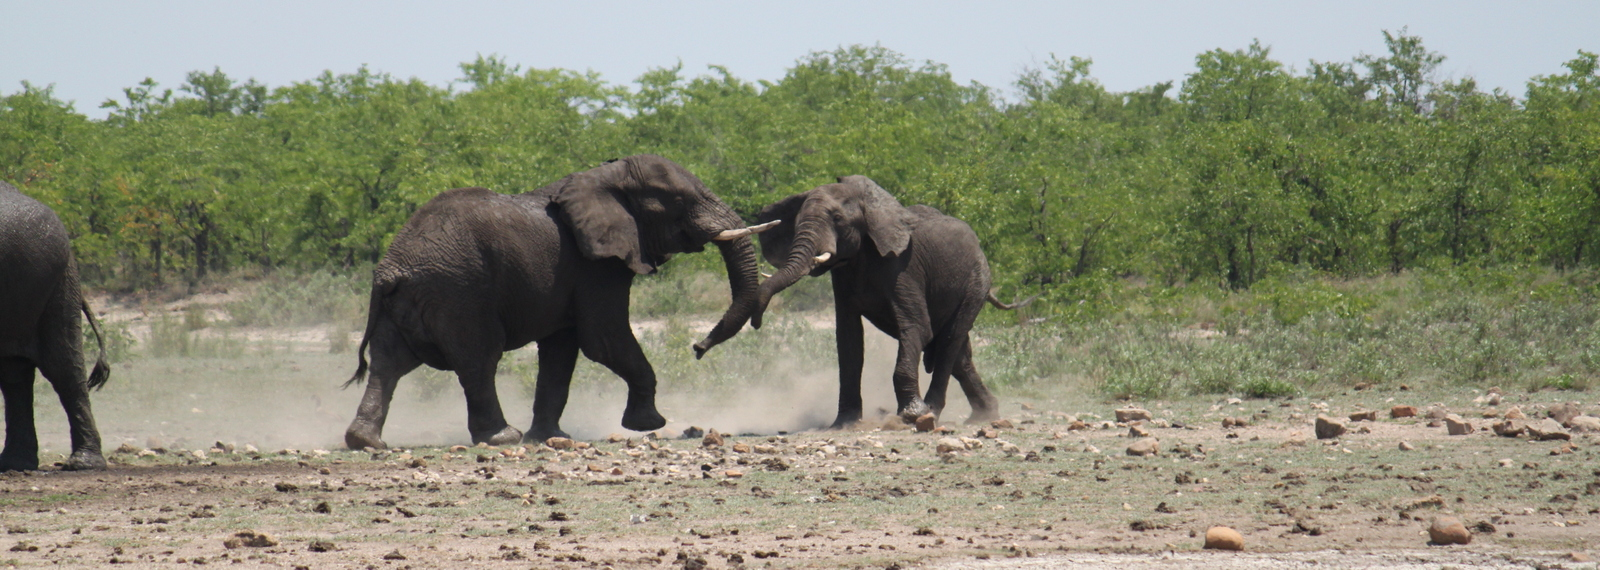 Fighting Elephants, Kruger, Zuid Afrika